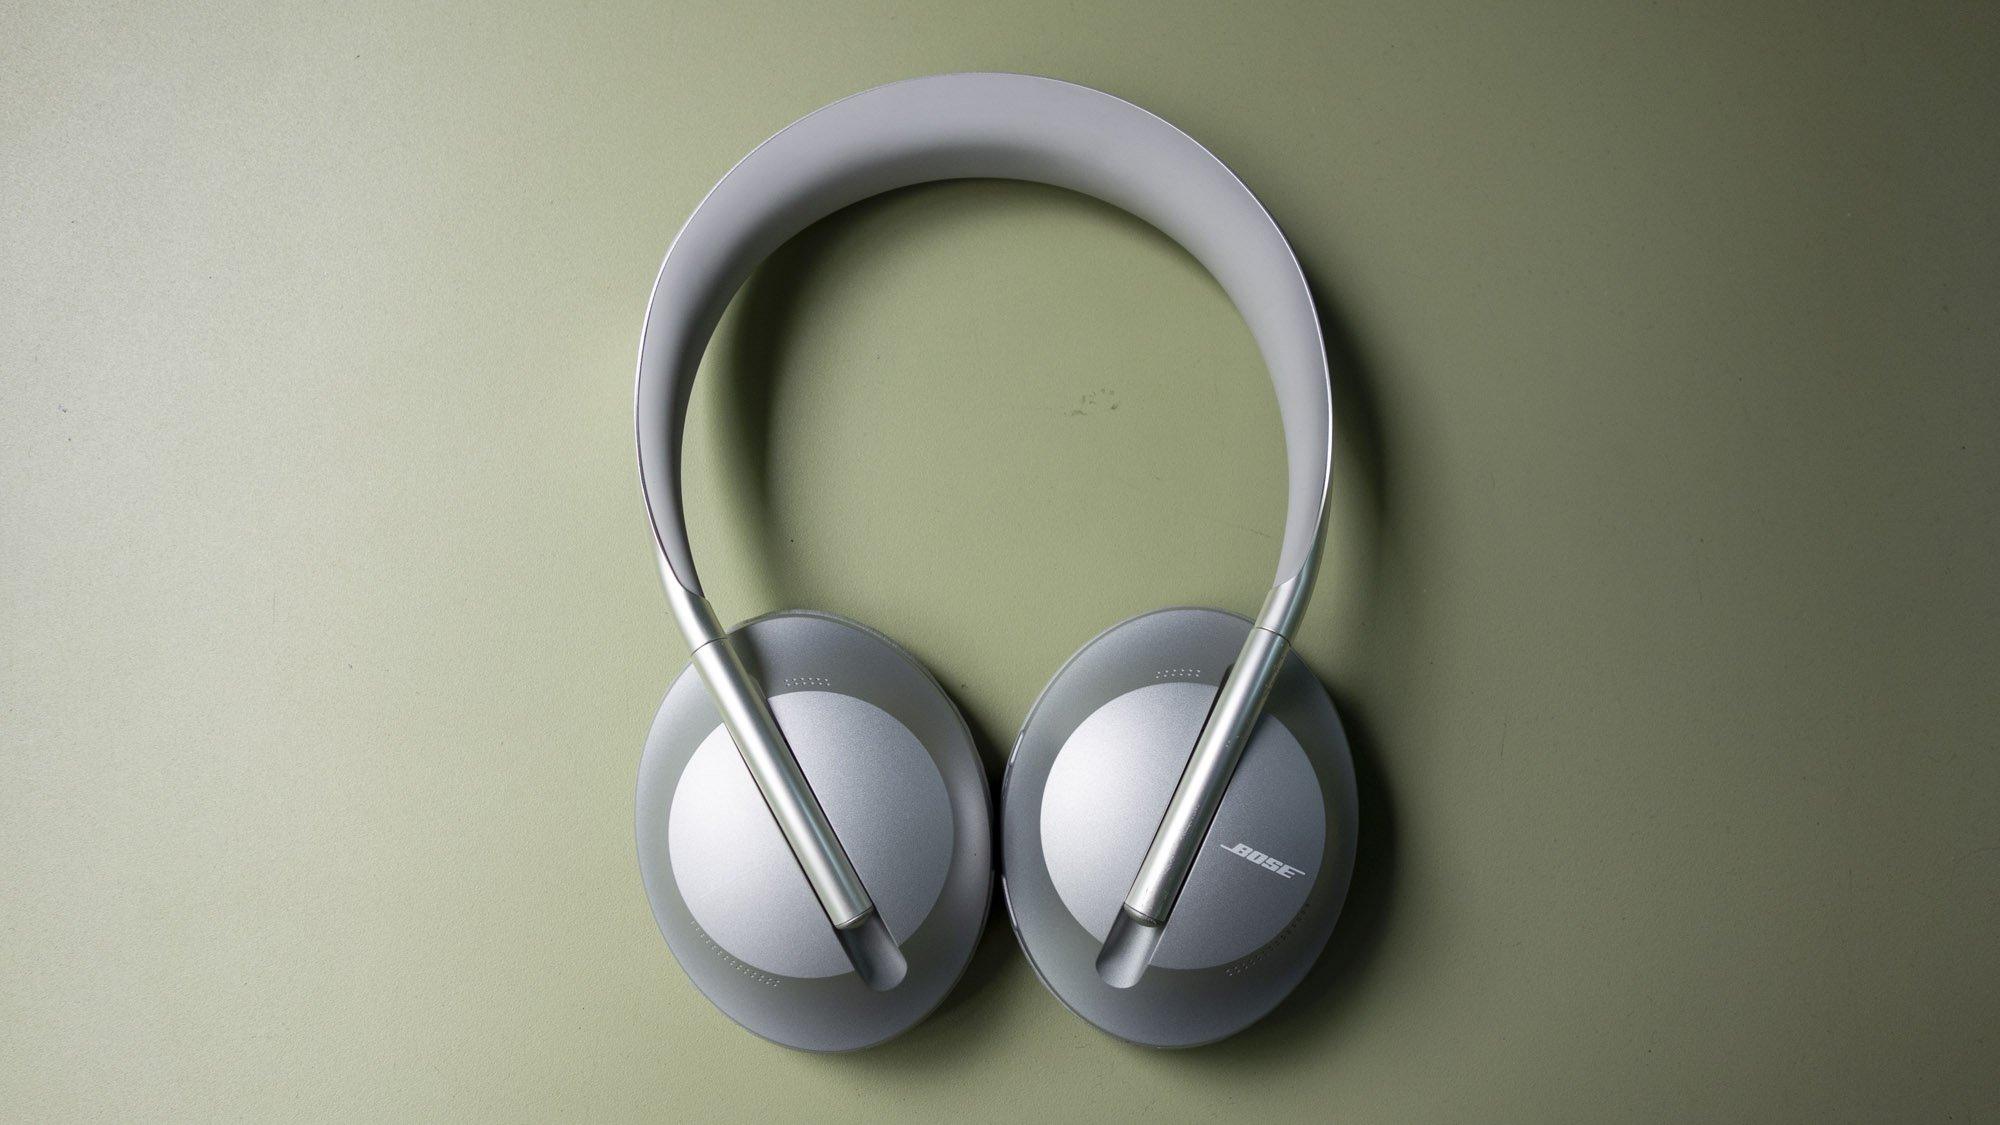 Best noise-cancelling headphones 2019: The best ANC